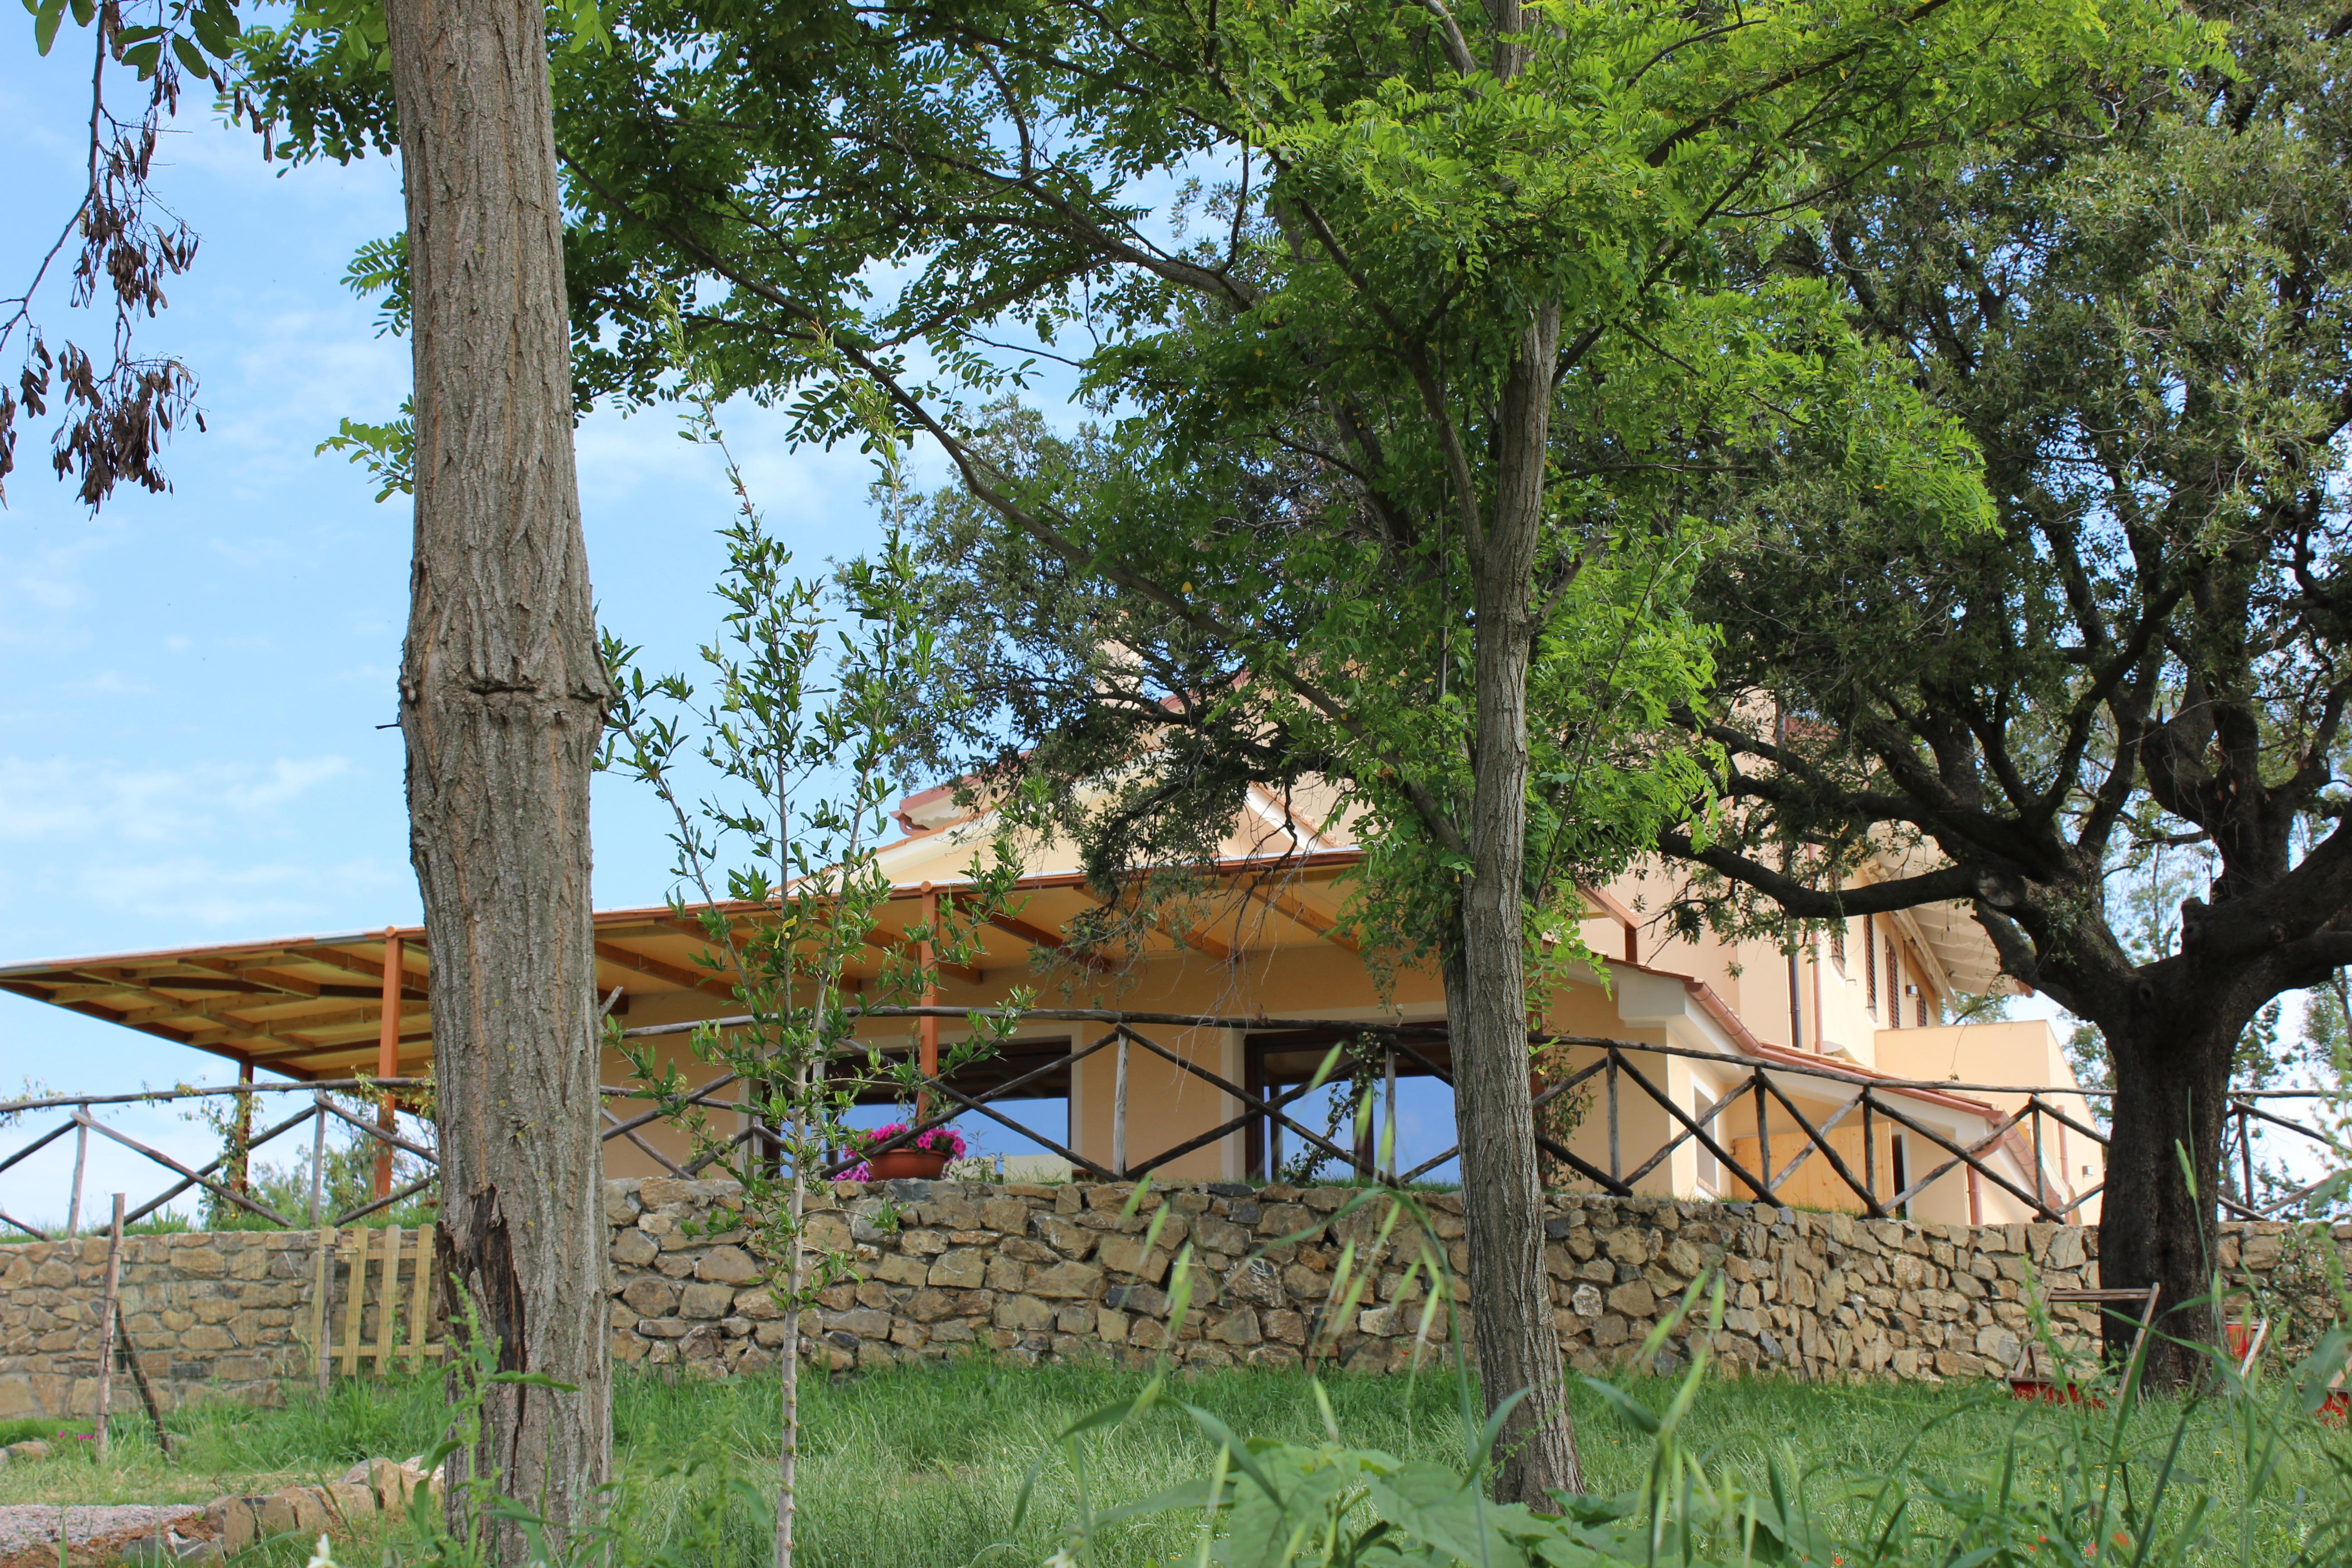 Agriturismo l'Anichino in maremma a Grosseto - Toscana